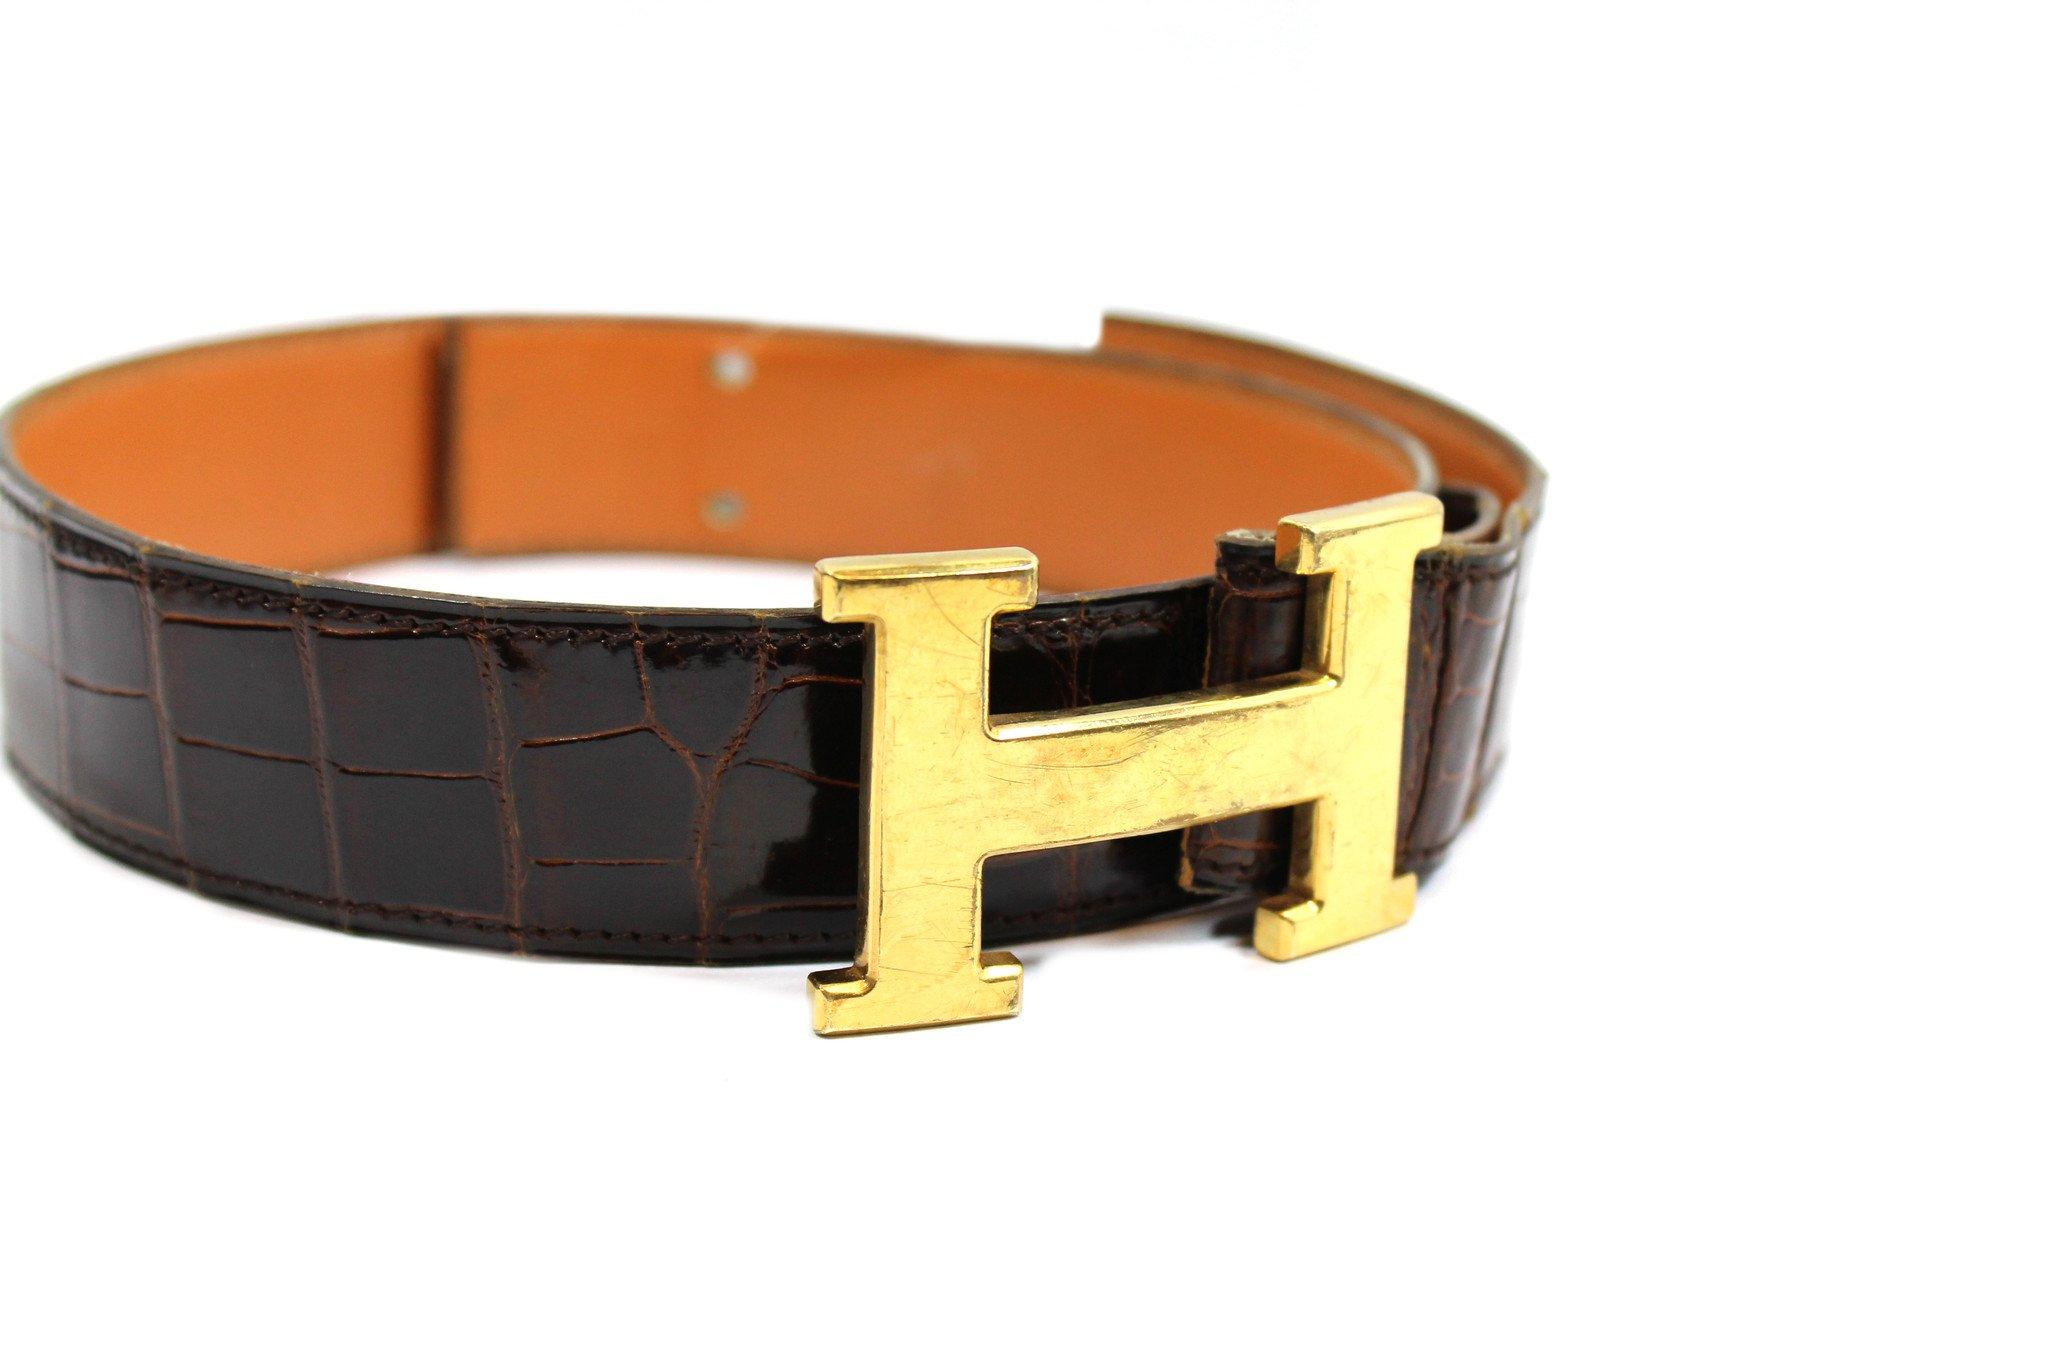 Hermès Vintage Brown Crocodile Belt with Gold Logo Buckle.